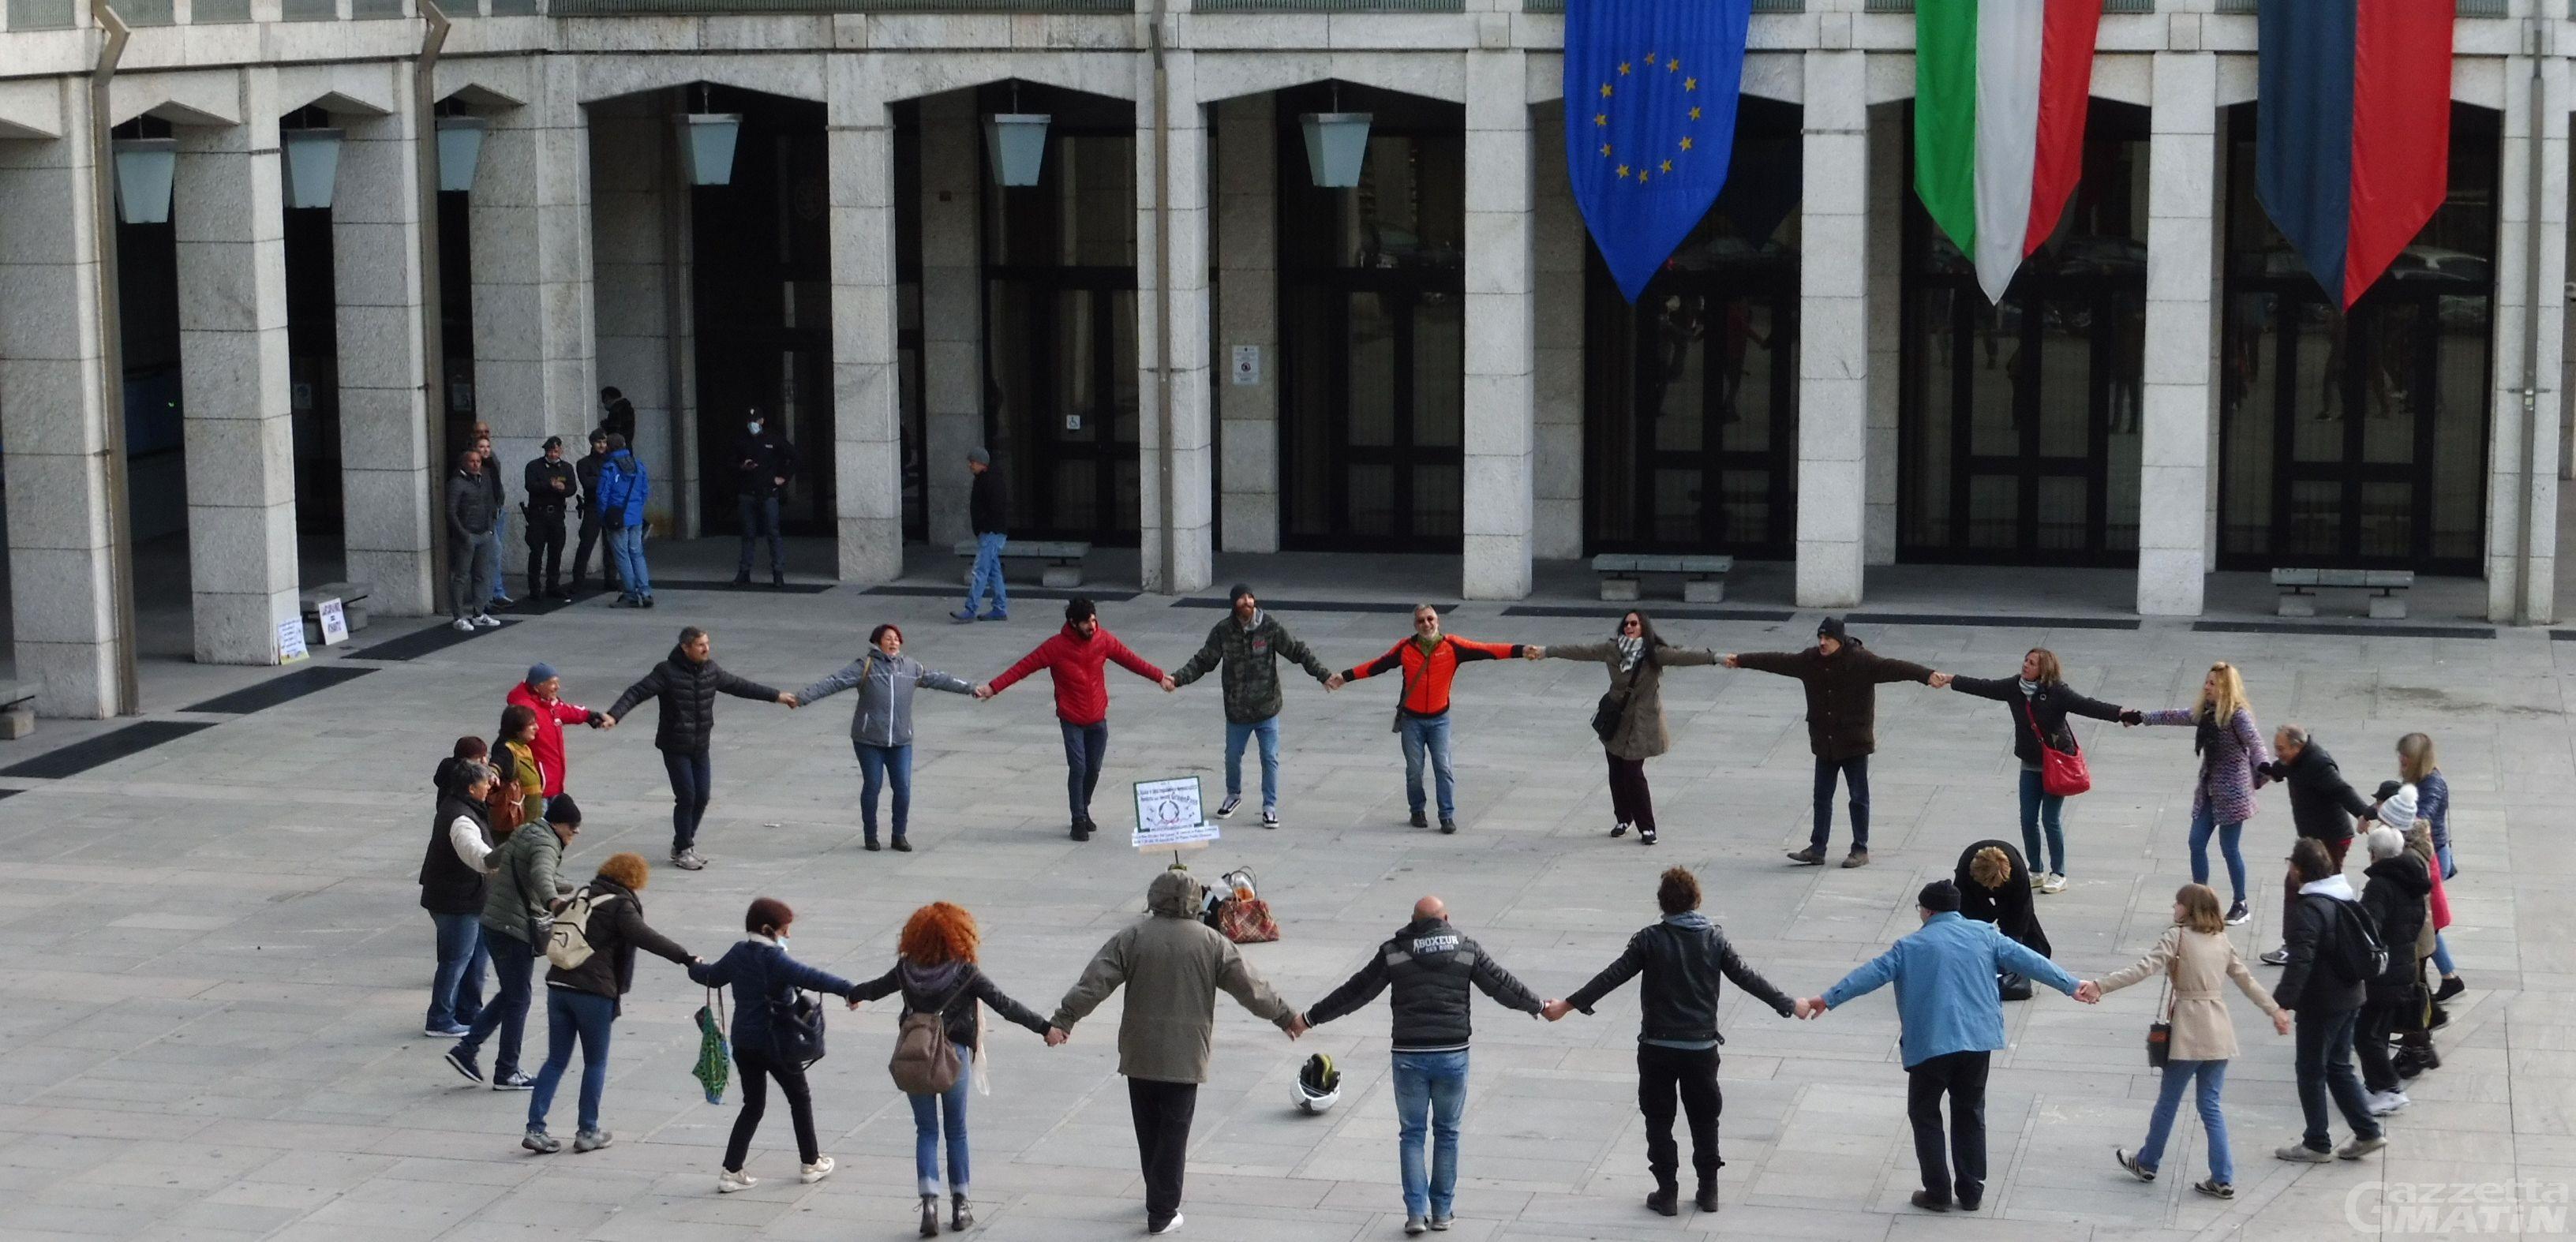 No Green pass: nuova manifestazione in piazza Deffeyes ad Aosta